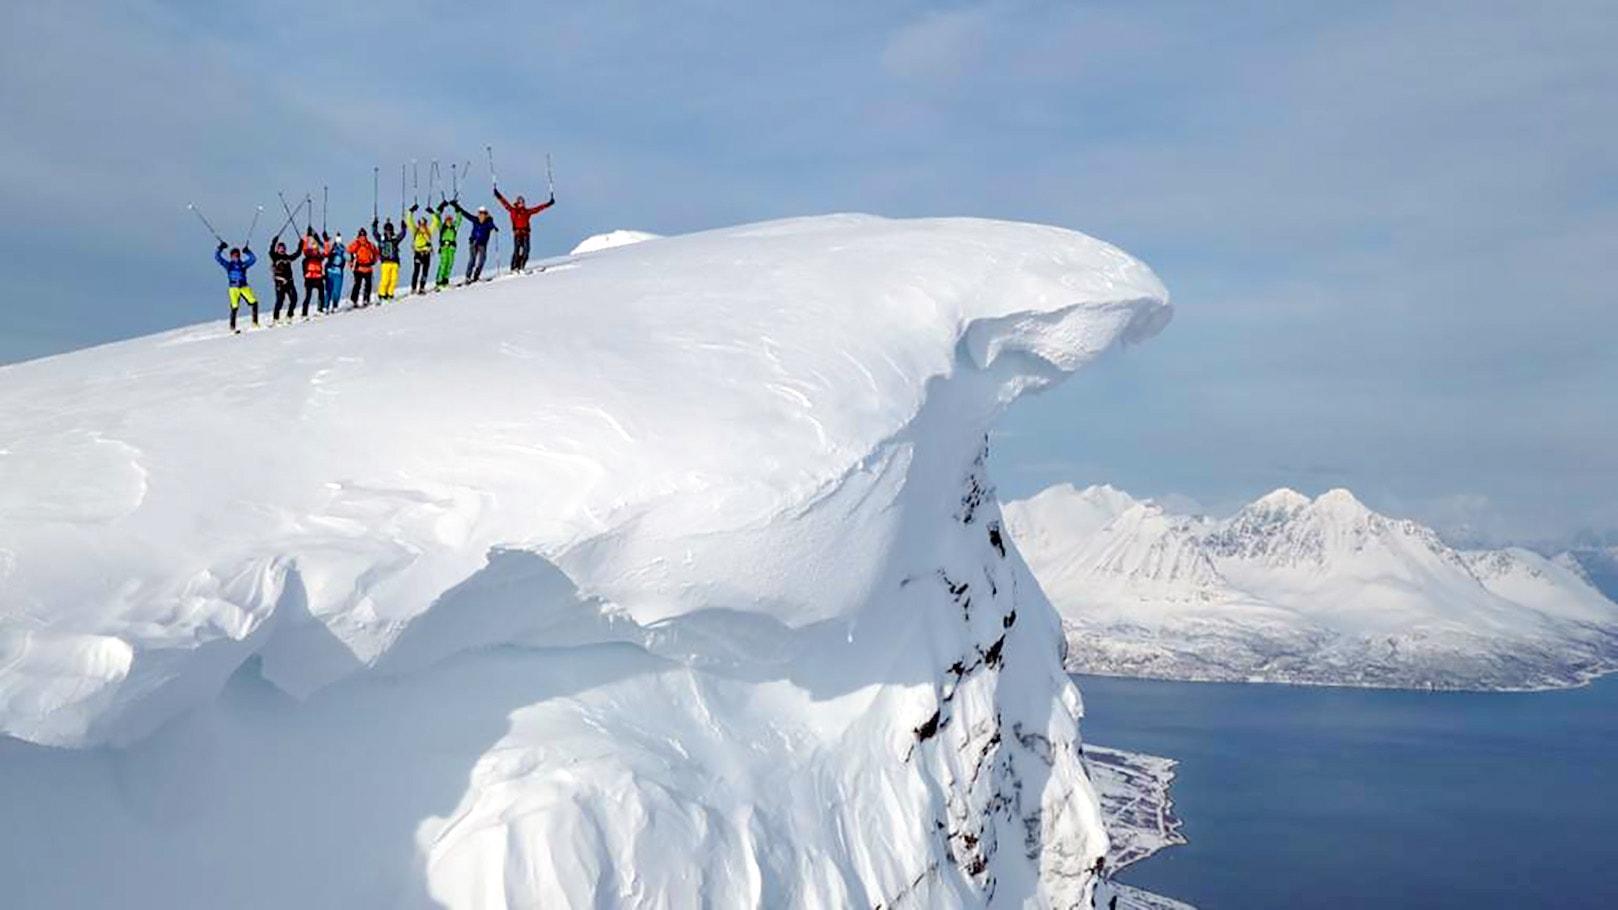 Blizz Leserreporter Skifahren in Kanada: Infoabend am 7. April